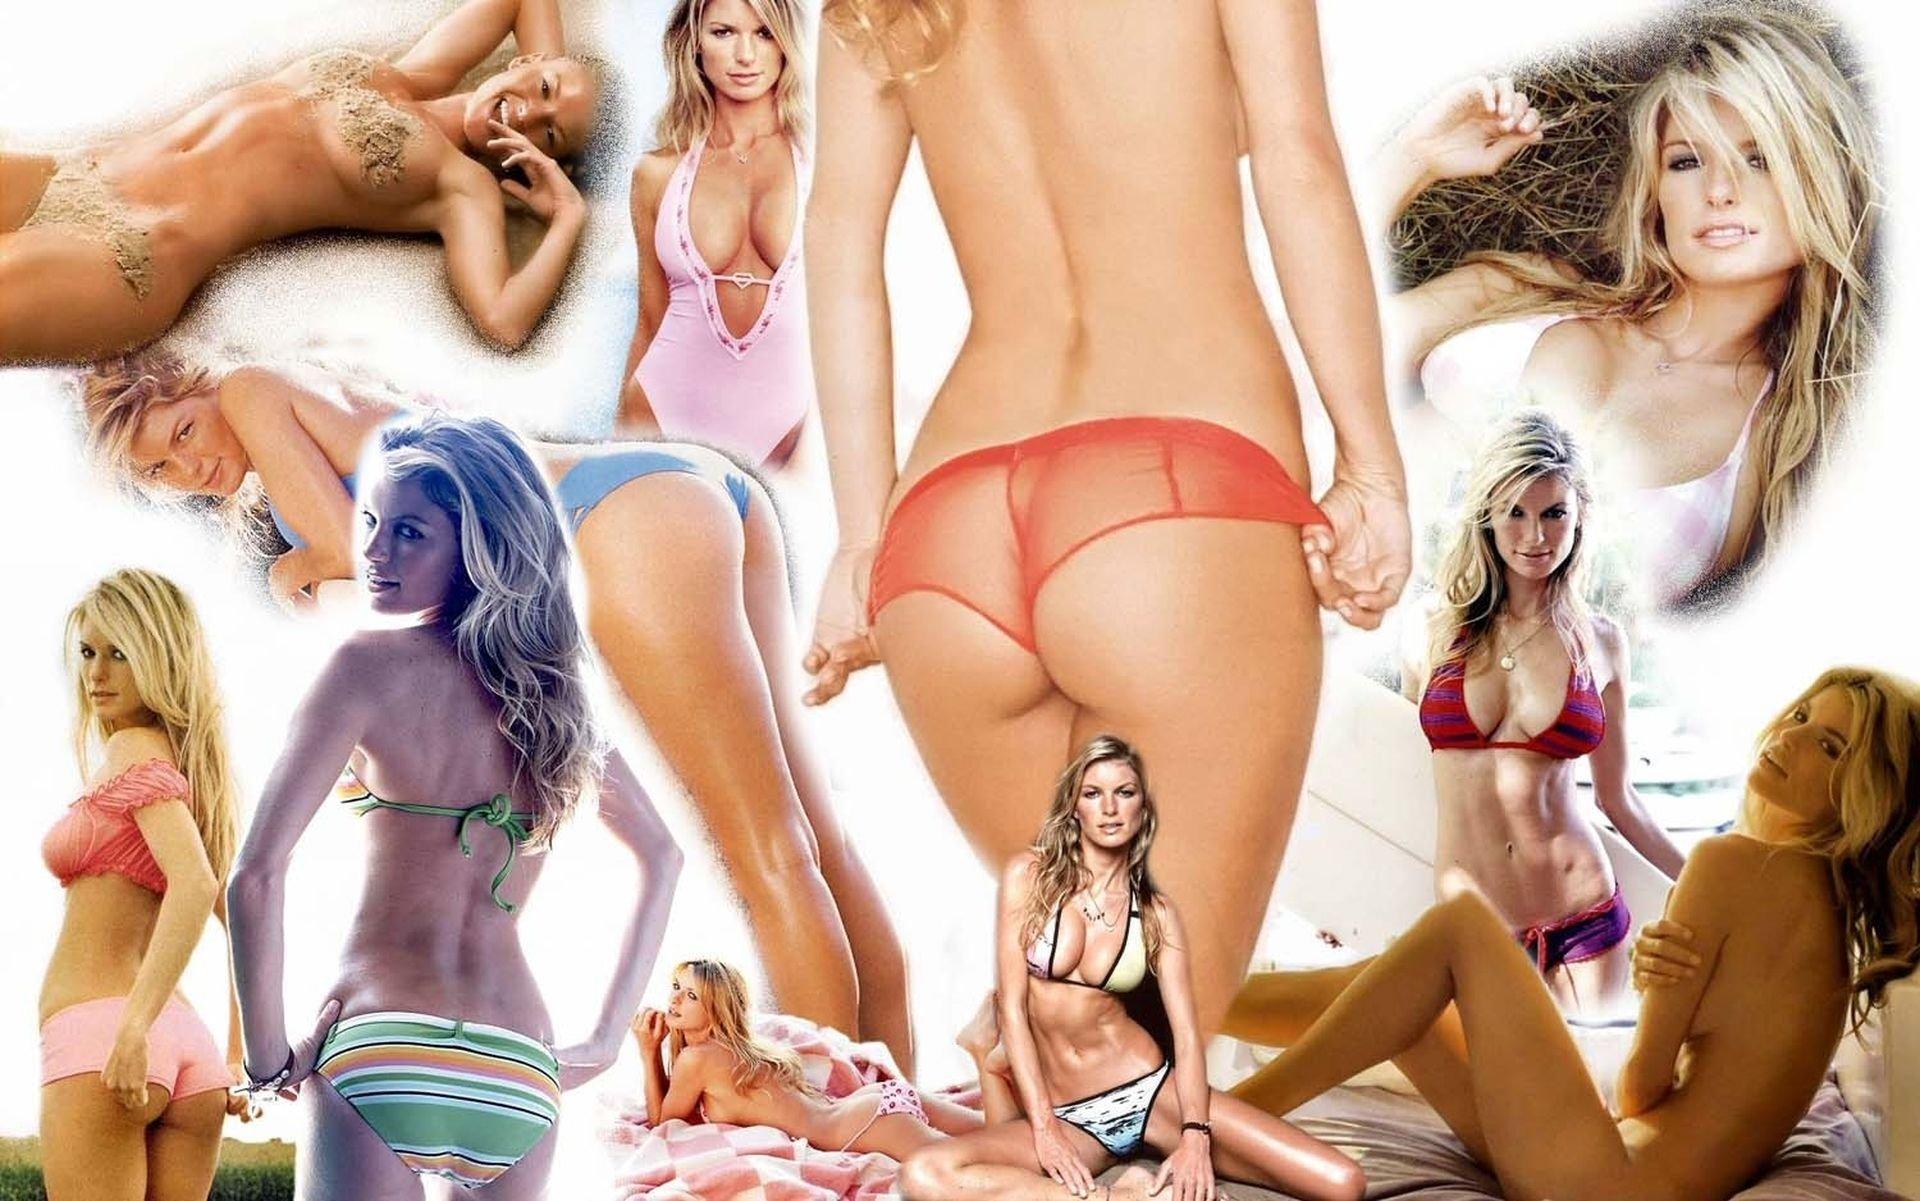 Marisa-Miller-Nude-TheFappeningBlog.com-30.jpg